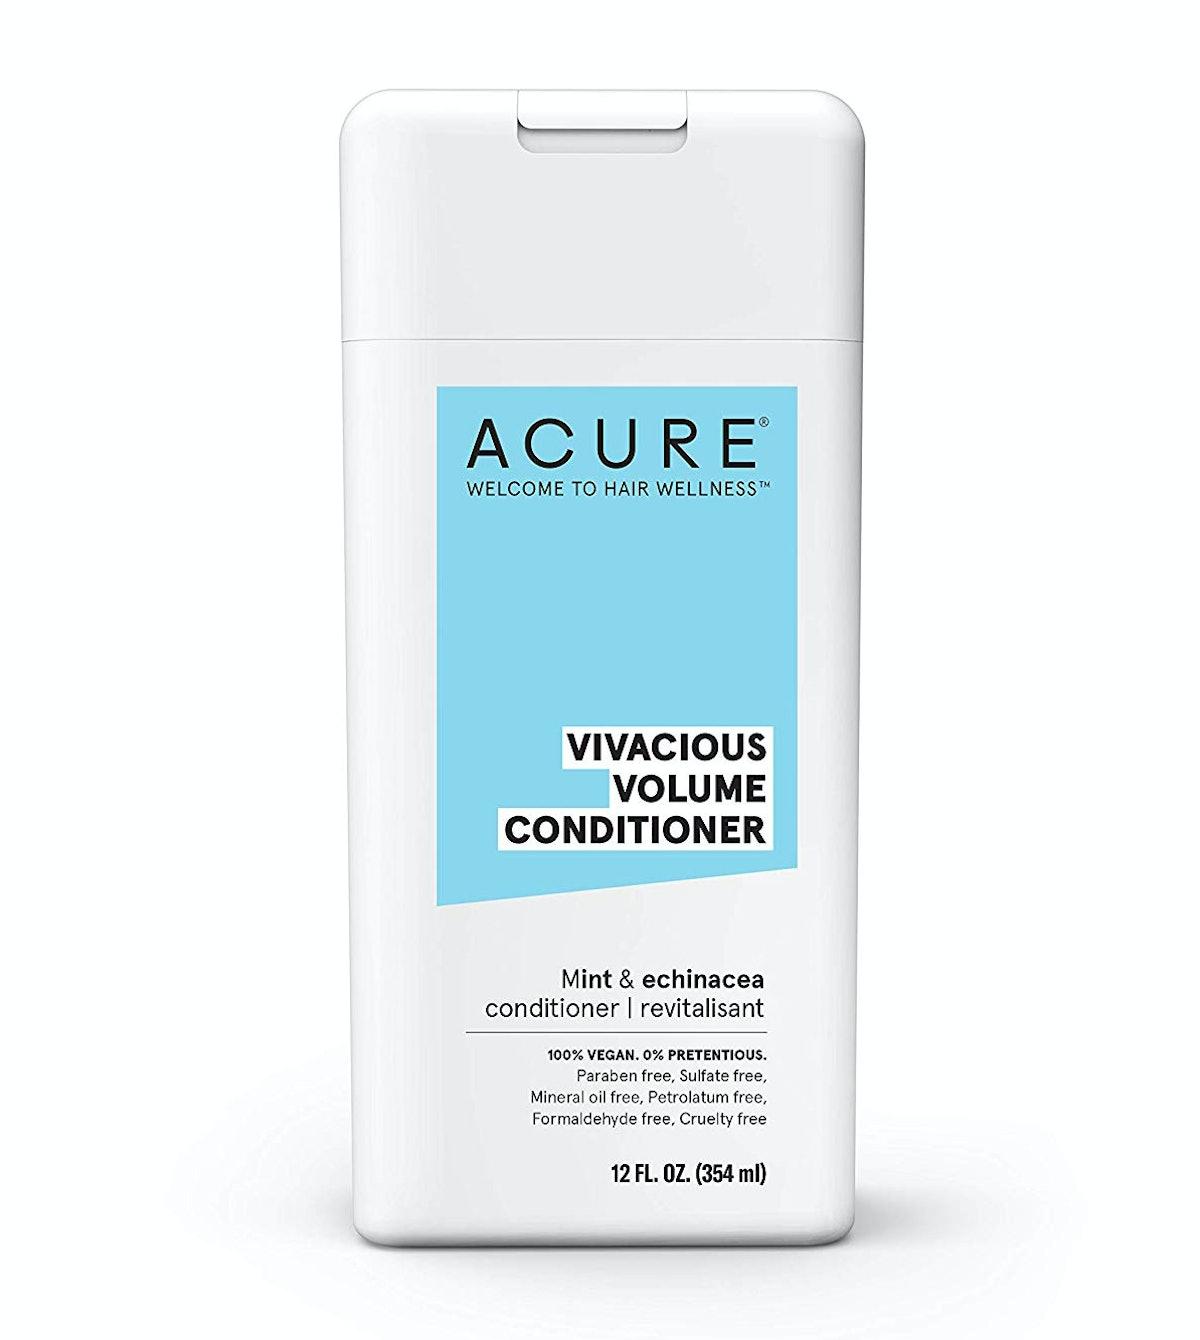 Acure Vivacious Volume Conditioner